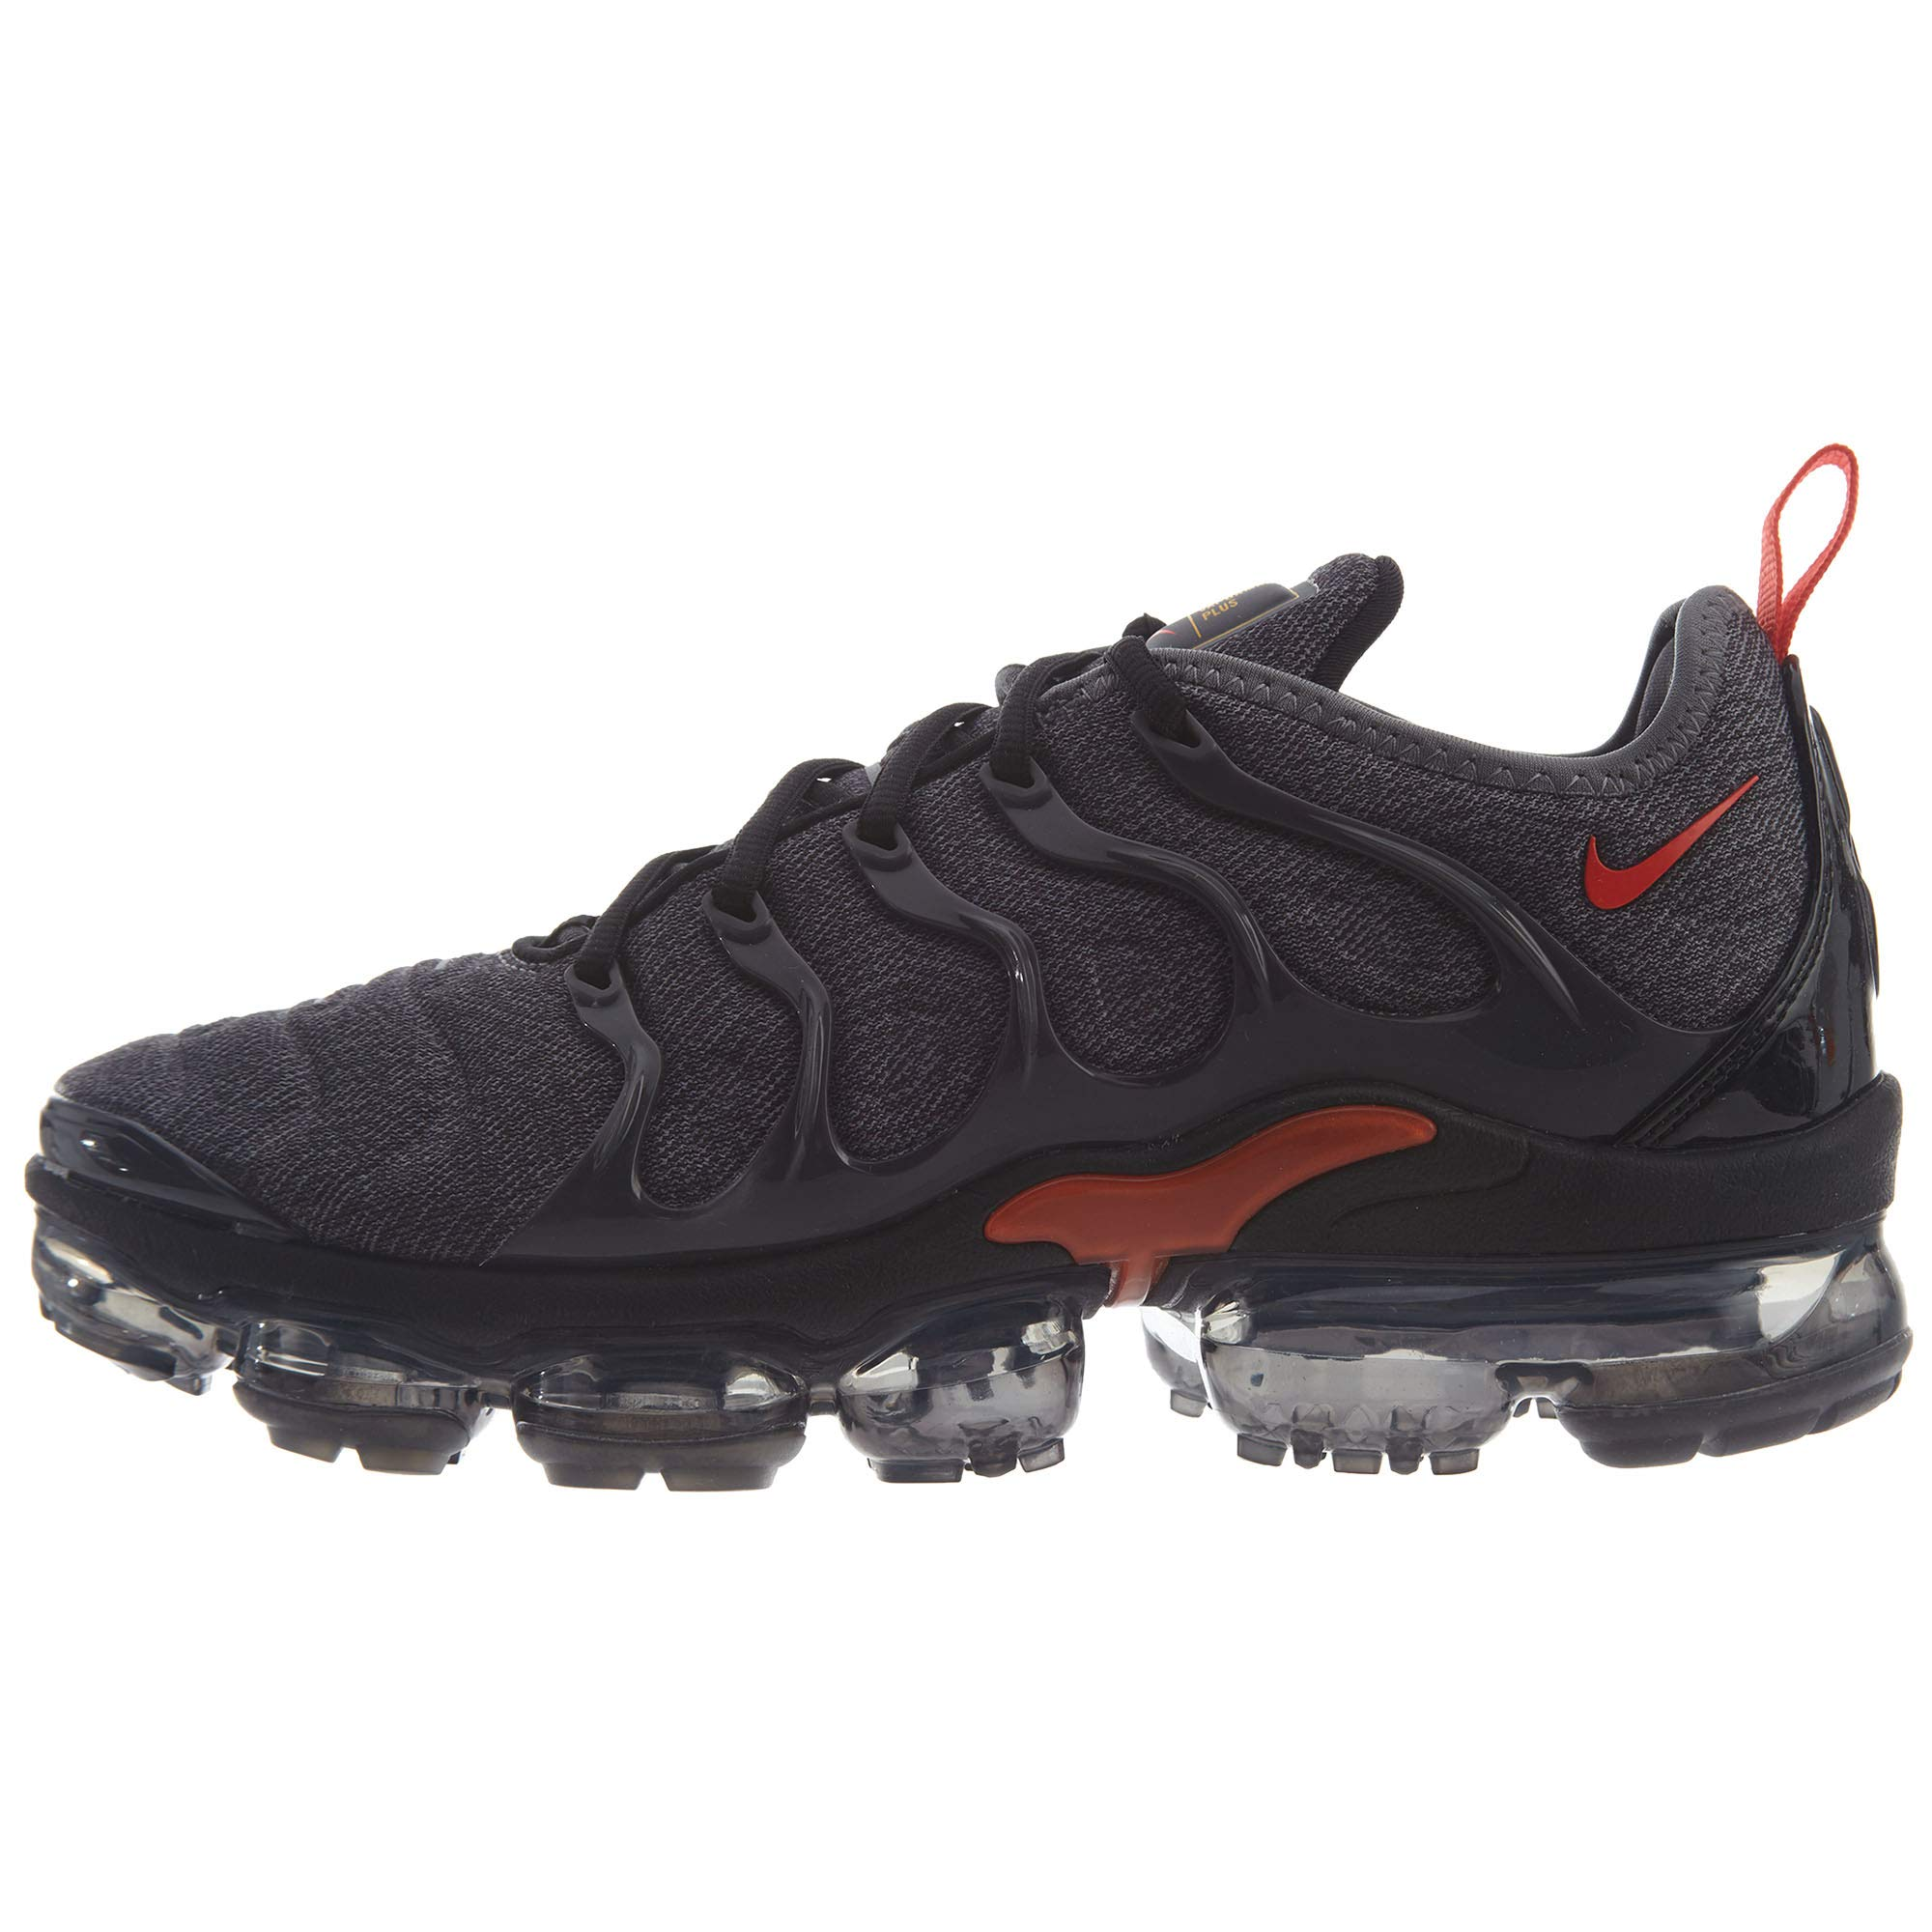 a829f07abbf Galleon - Nike Air Vapormax Plus Mens 924453-012 Size 13